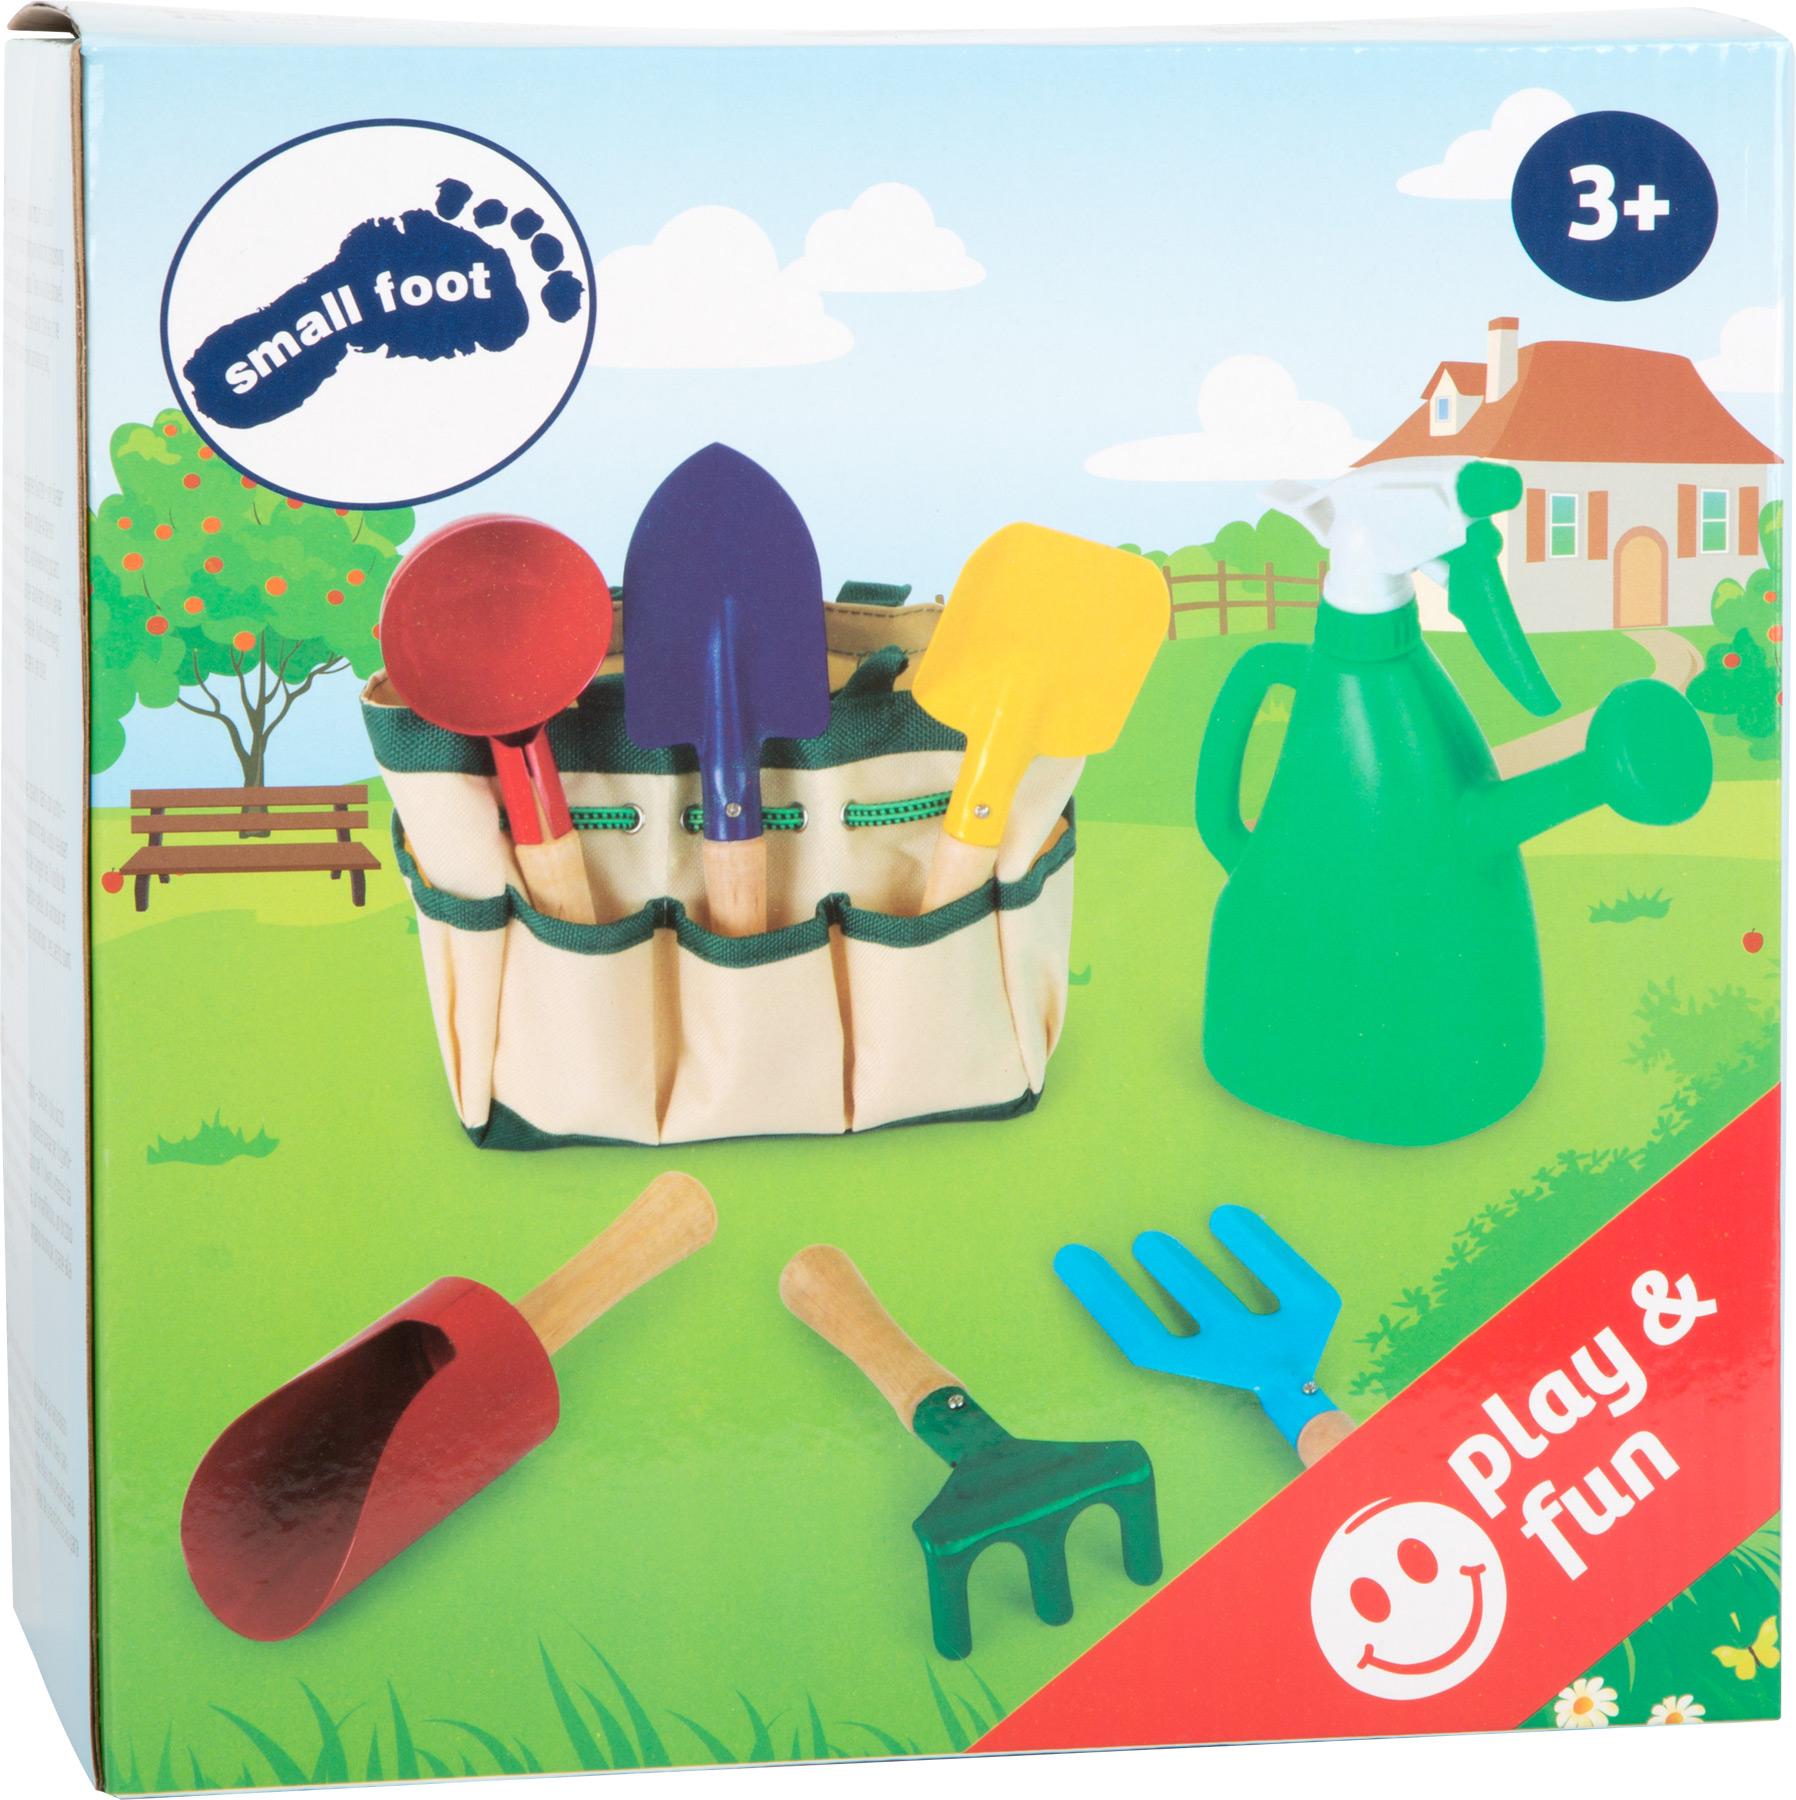 Children's Gardening Bag and Tools